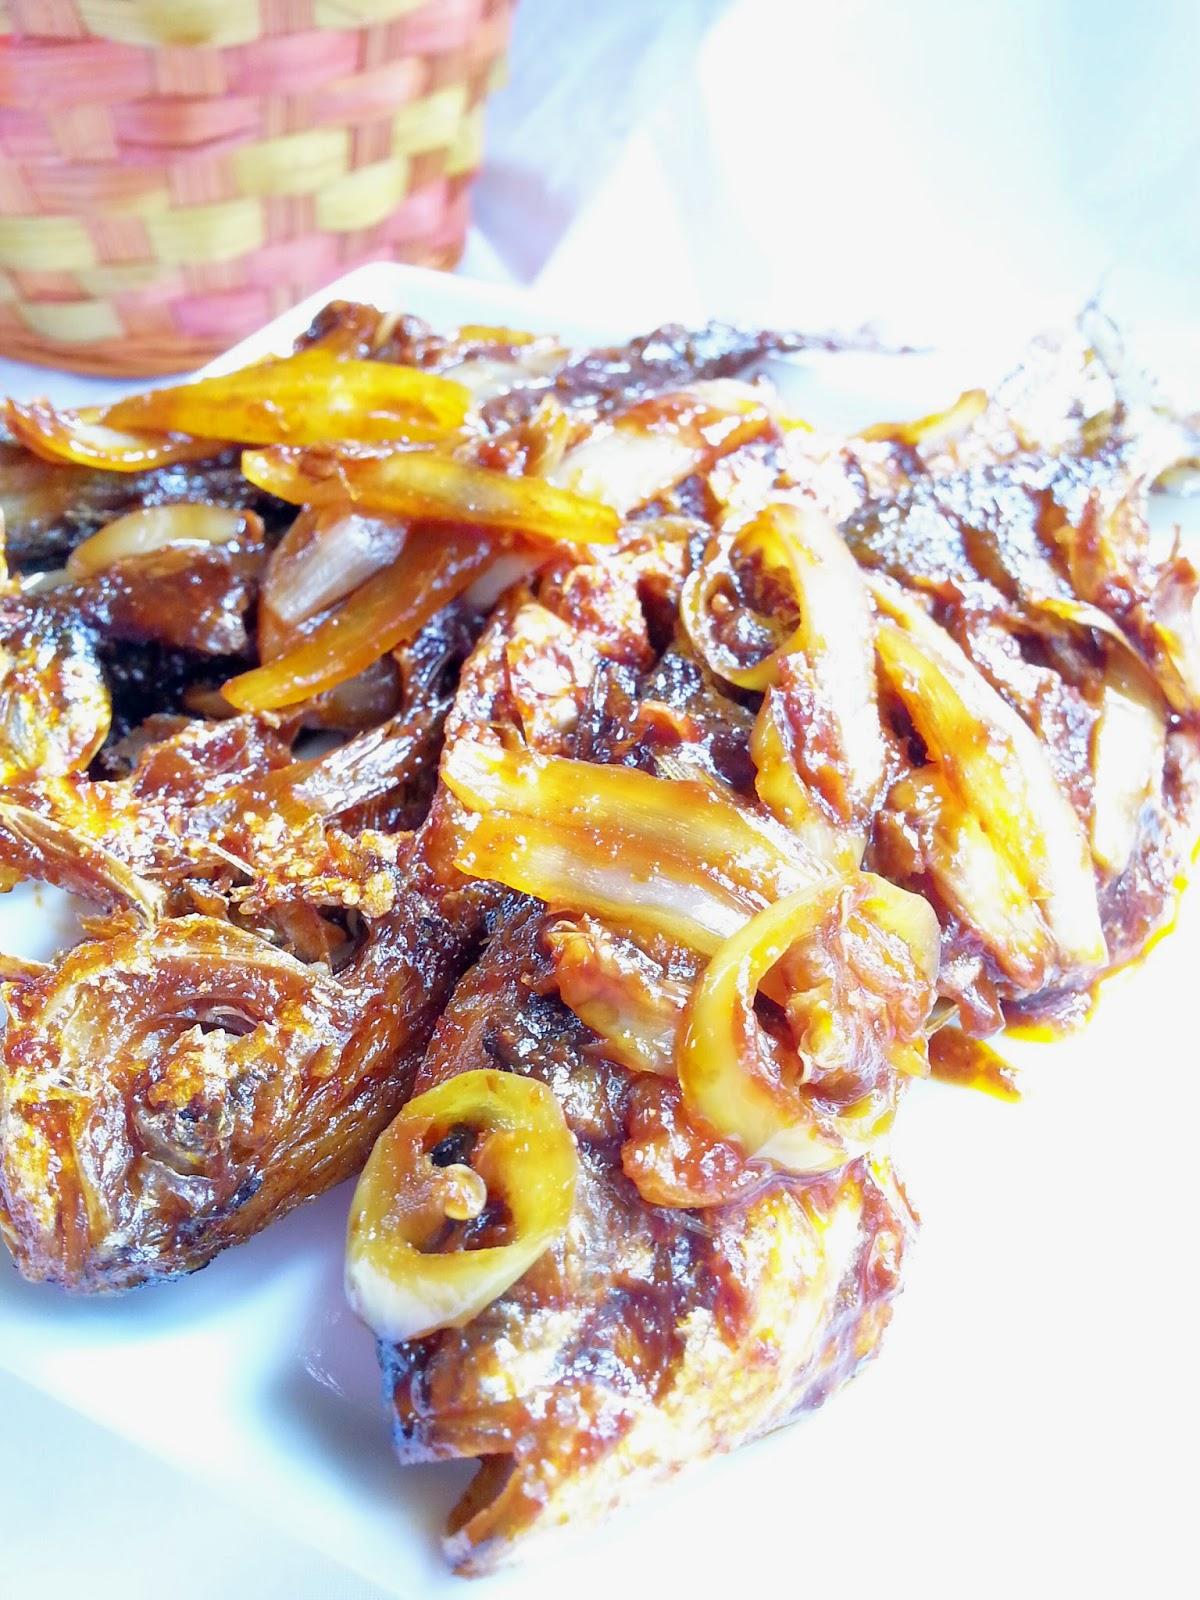 resepi ikan goreng kicap ikan masak kicap mudah  senang ceritera  gadis biru goreng dlm Resepi Ikan Selar Masak Pedas Enak dan Mudah